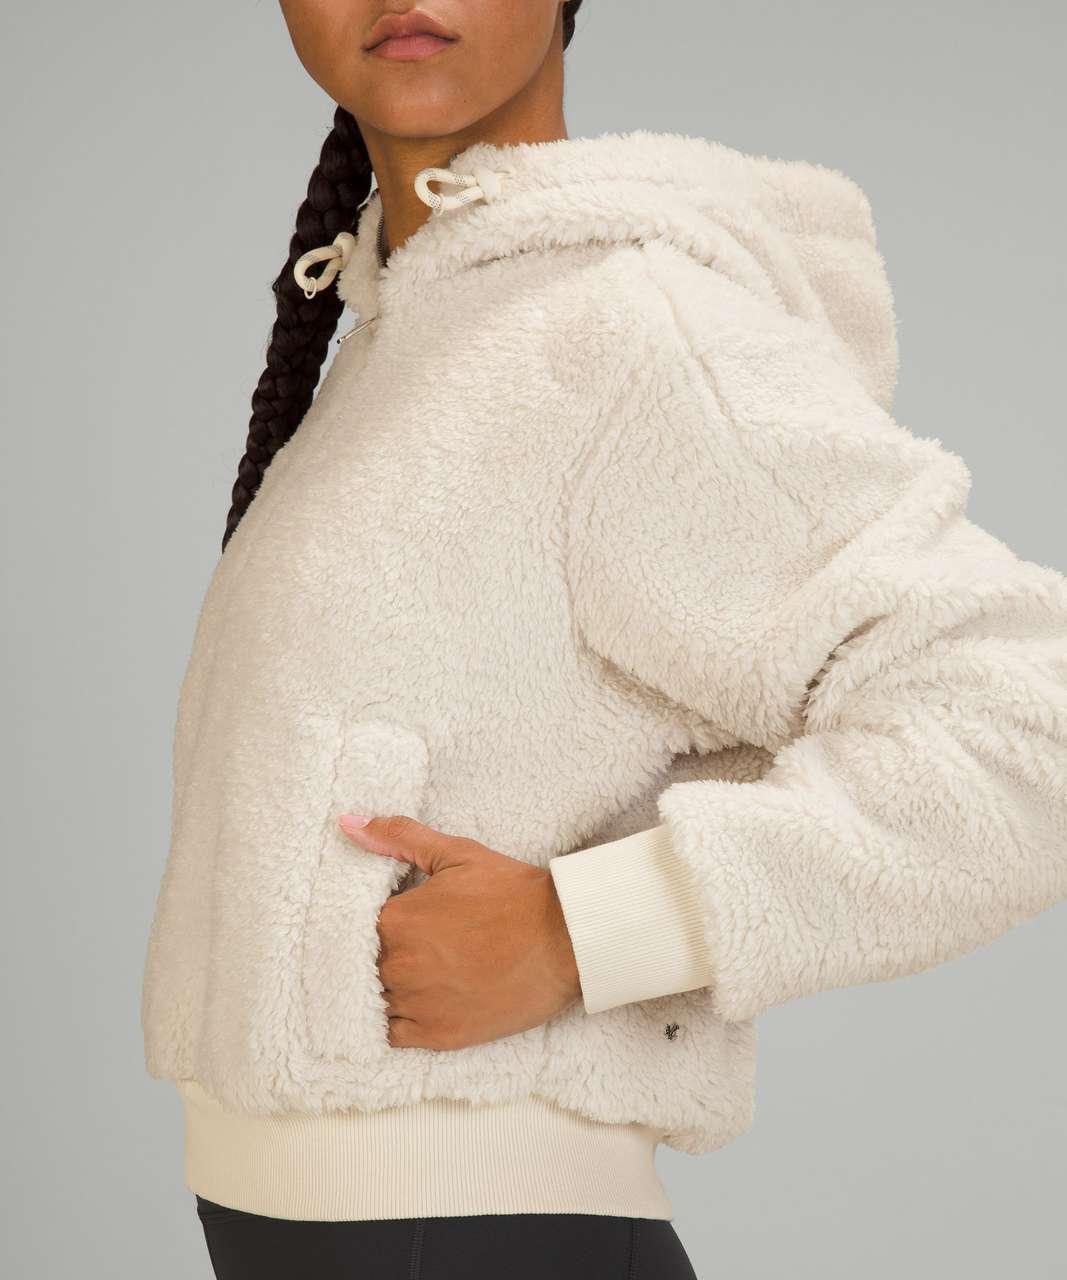 Lululemon Textured Fleece 1/2 Zip - White Opal